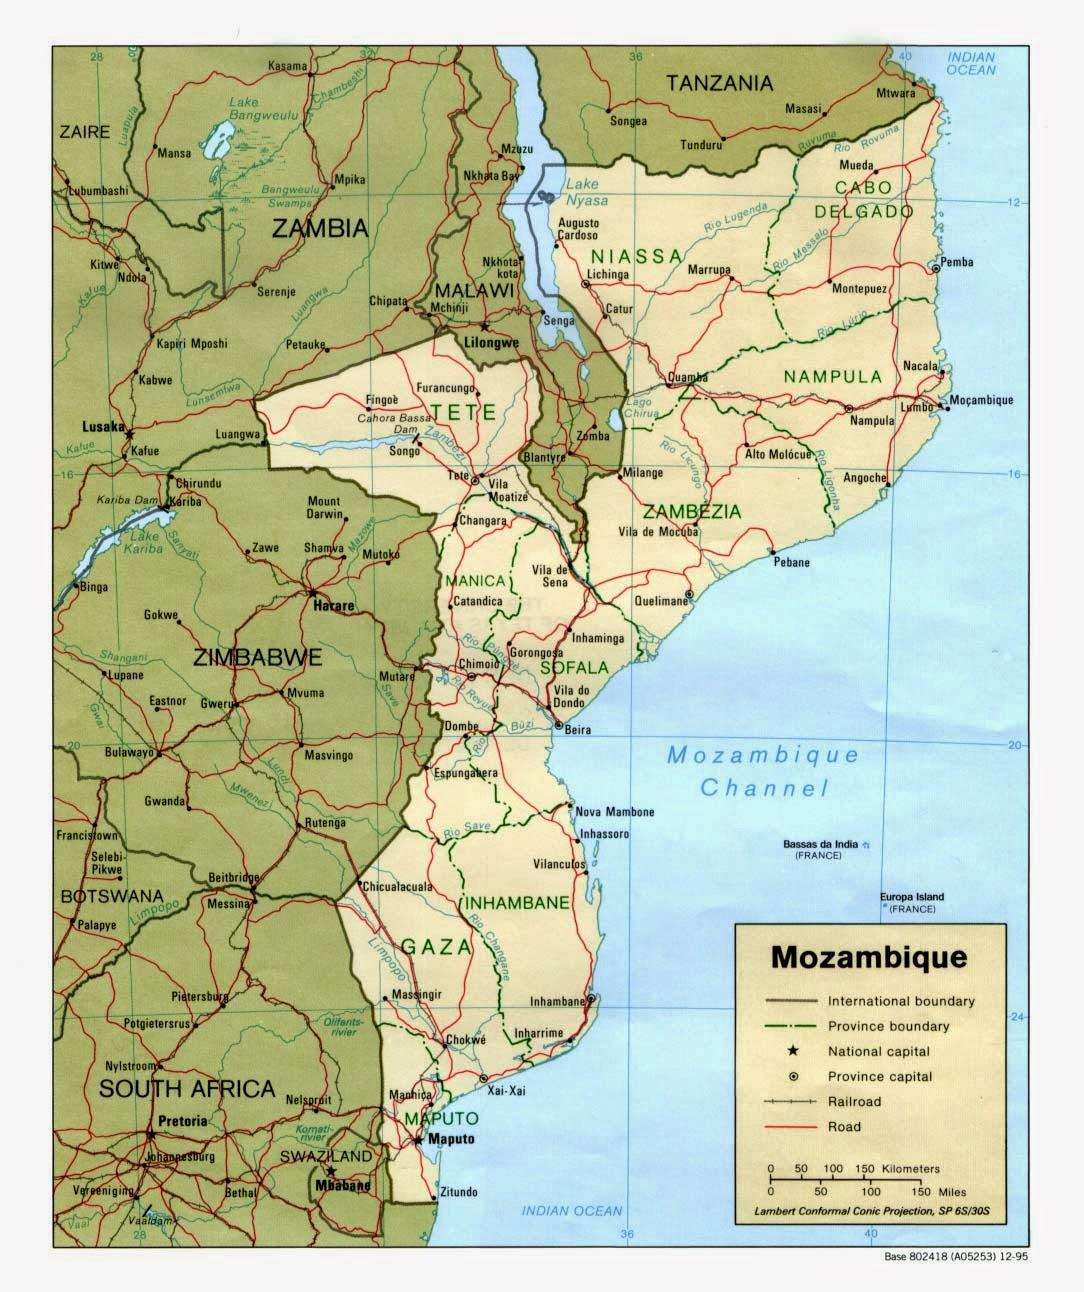 Peta Negara Mozambique